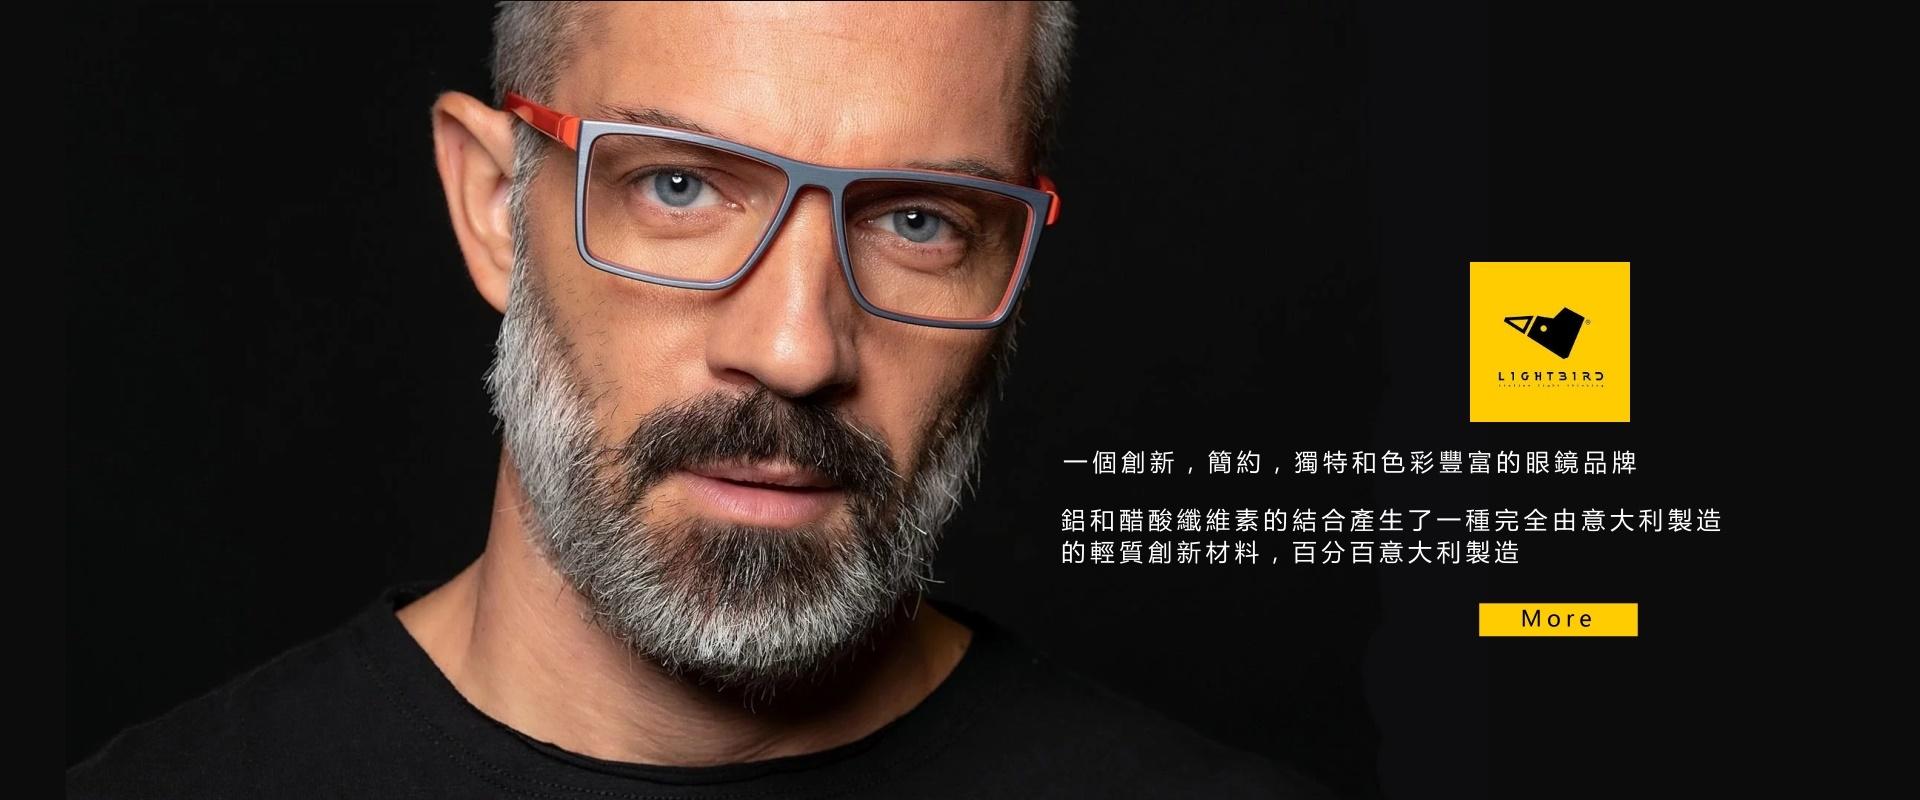 LIGHTBIRD 是一個創新,簡約,獨特和色彩豐富的眼鏡品牌,鋁和醋酸纖維素的結合產生了一種完全由意大利製造的輕質創新材料,百分百意大利製造。